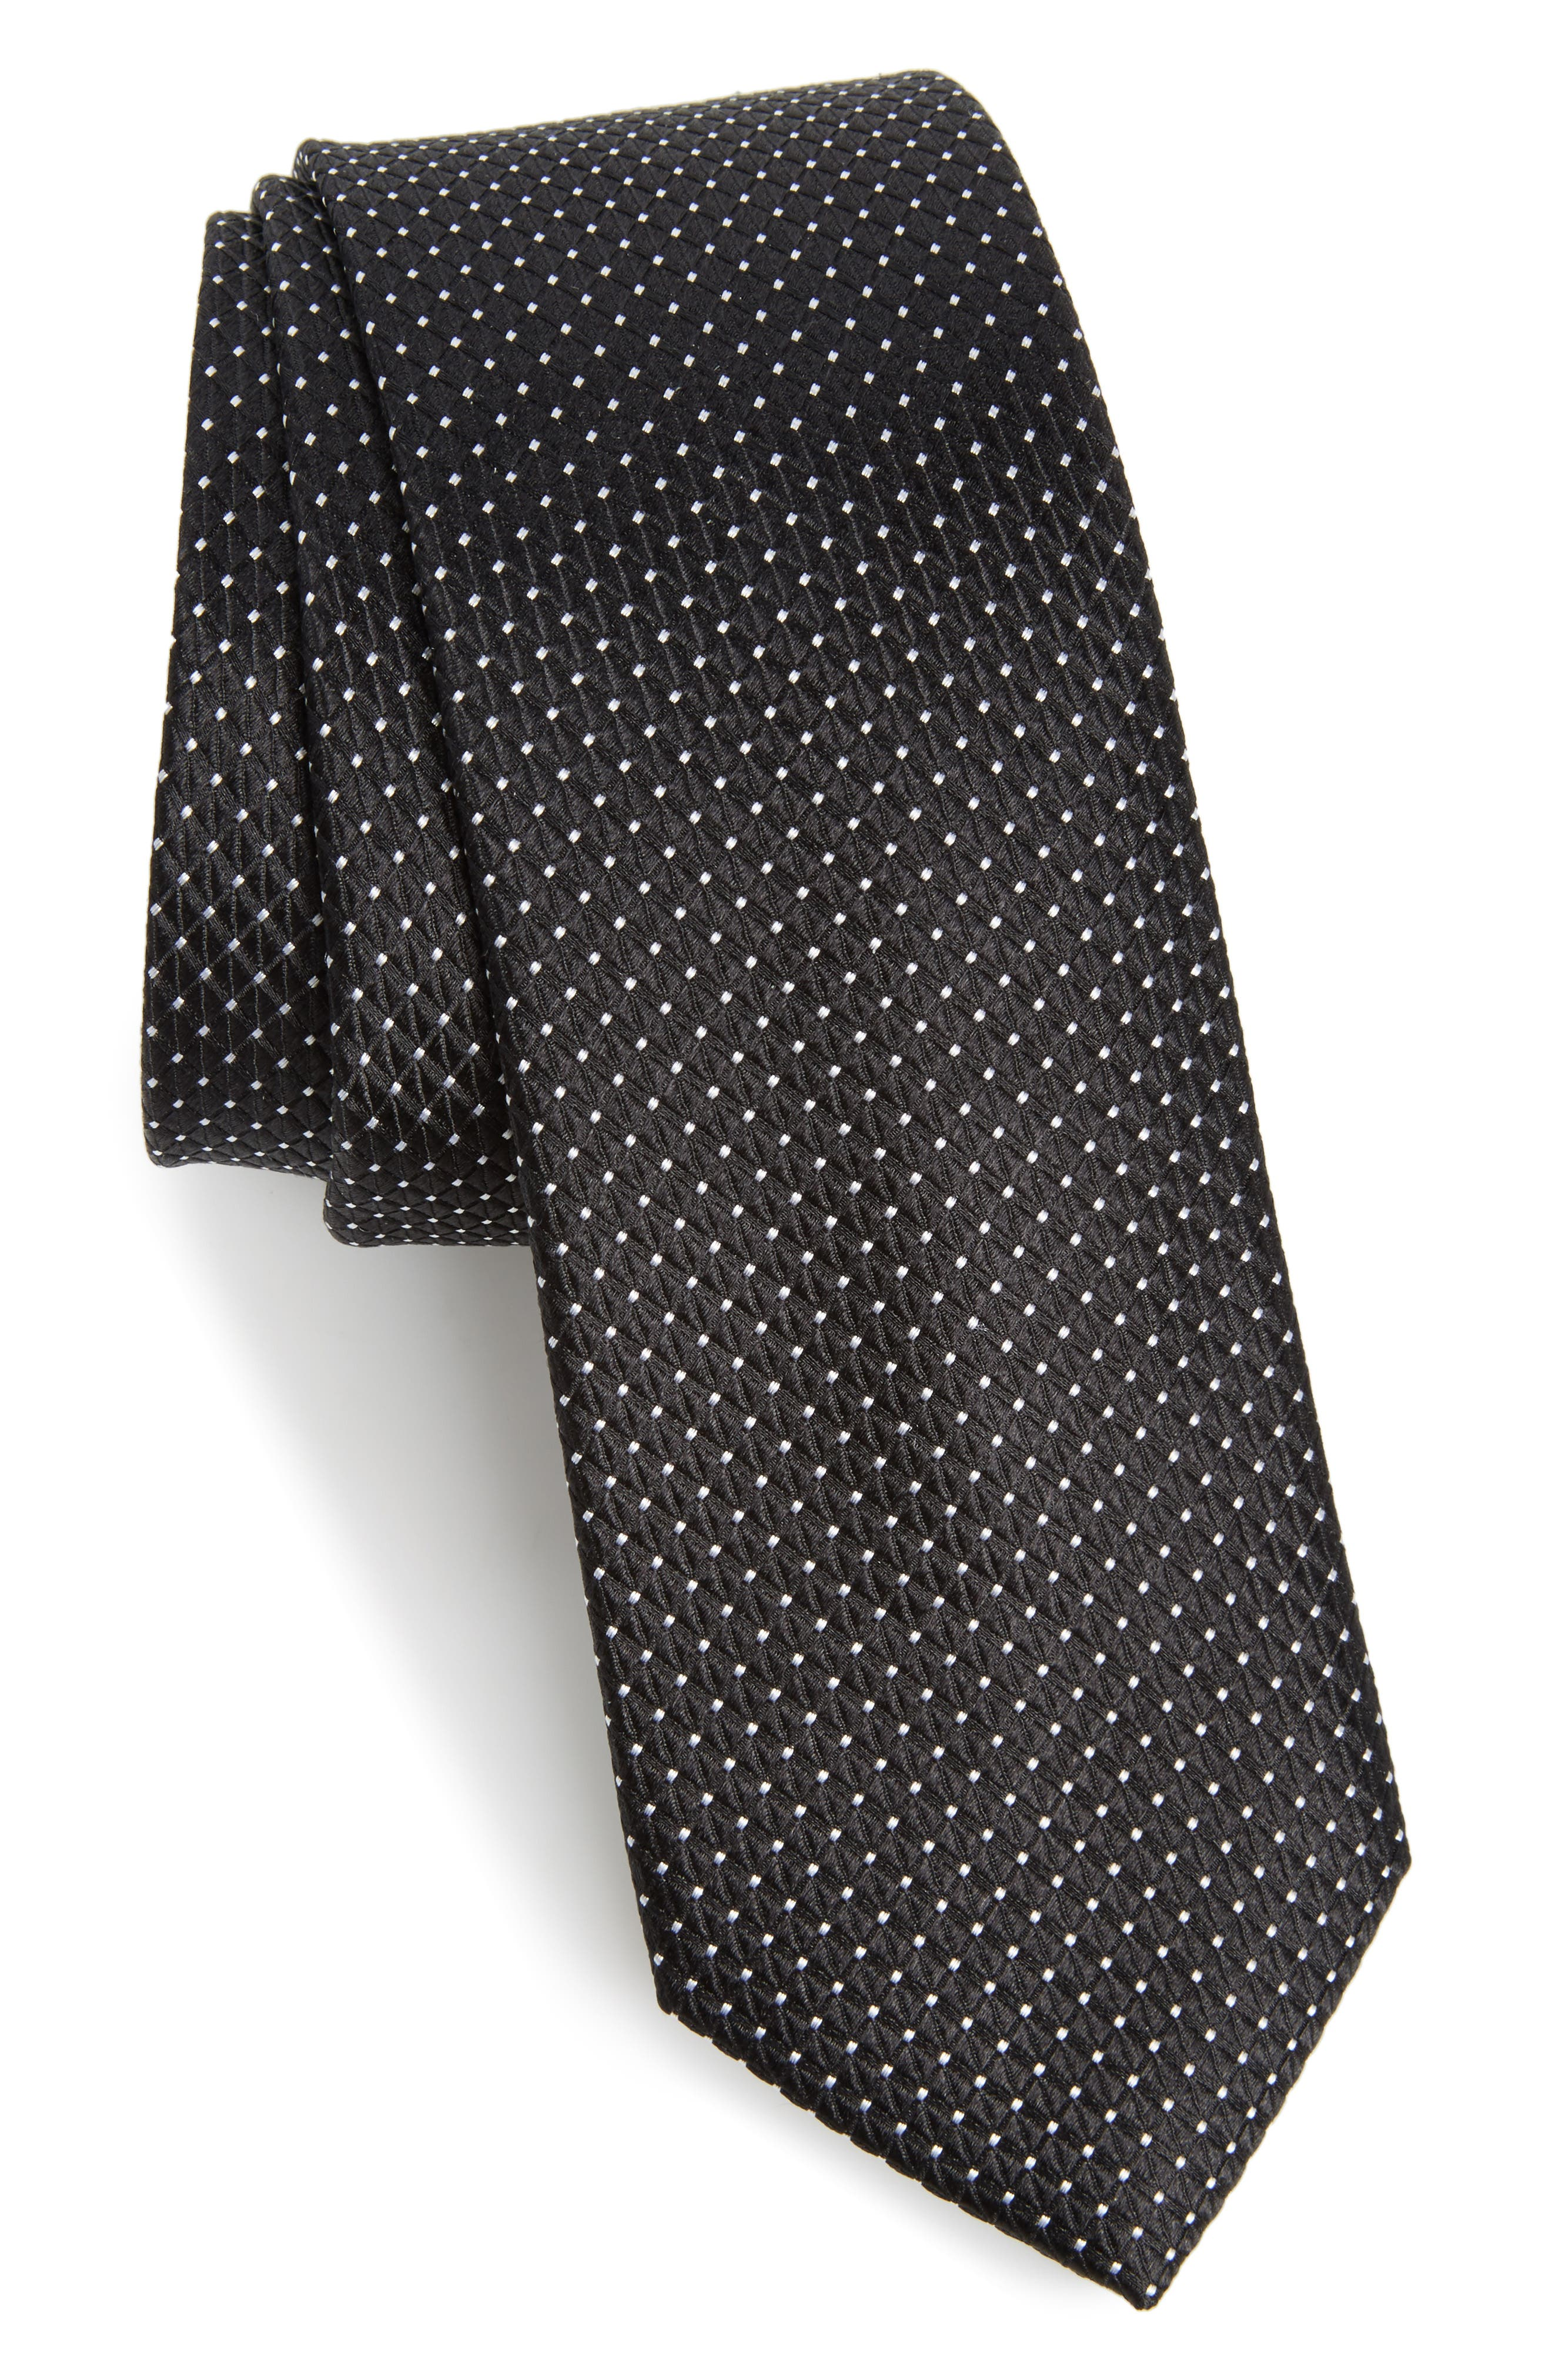 Main Image - Nordstrom Men's Shop Hammond Neat Silk Tie